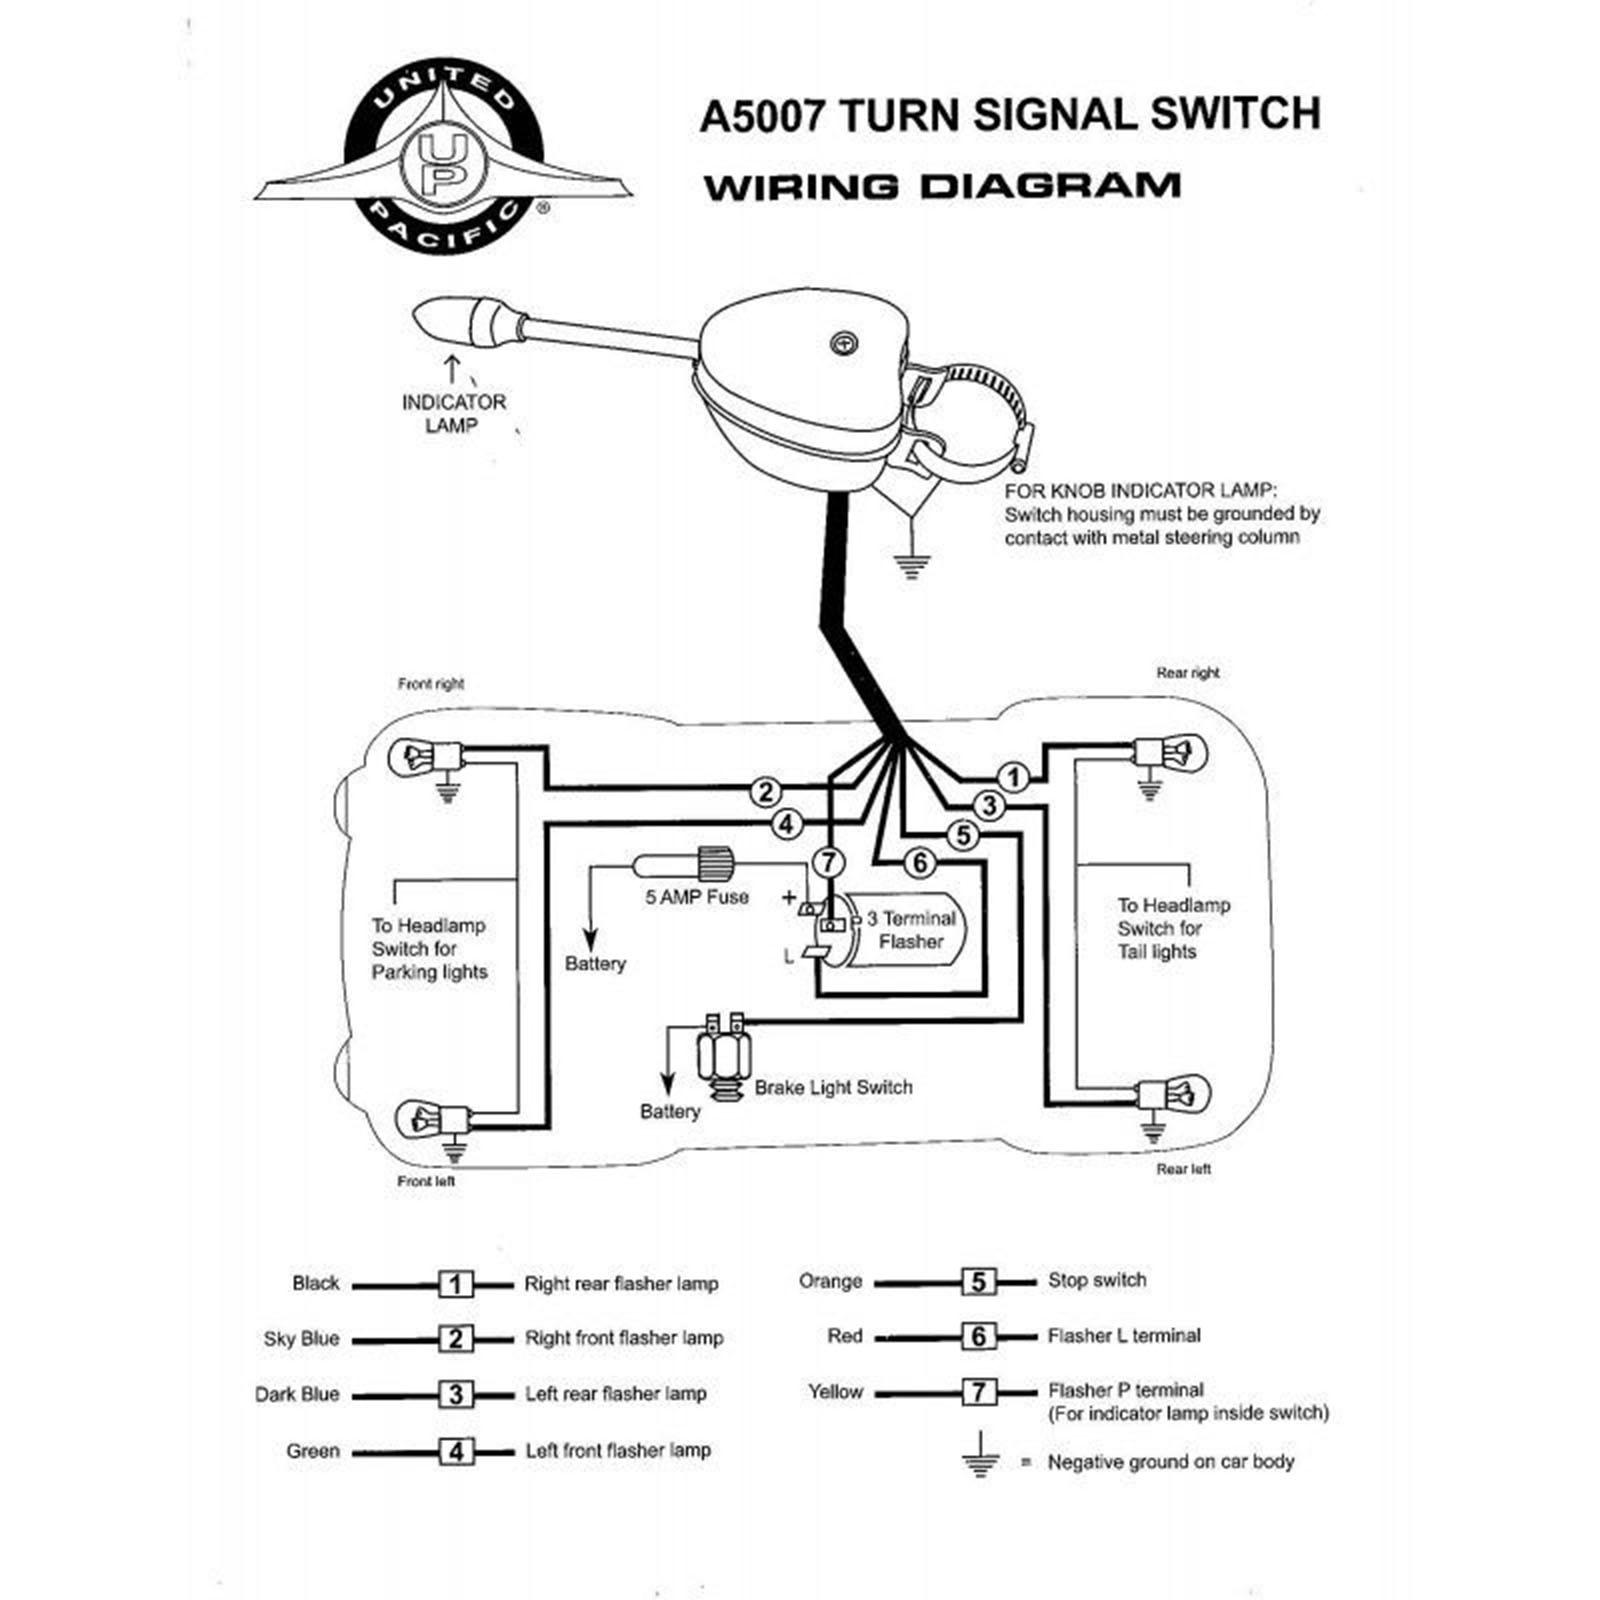 Willys Turn Signal Flasher Diagram | Wiring Diagram on